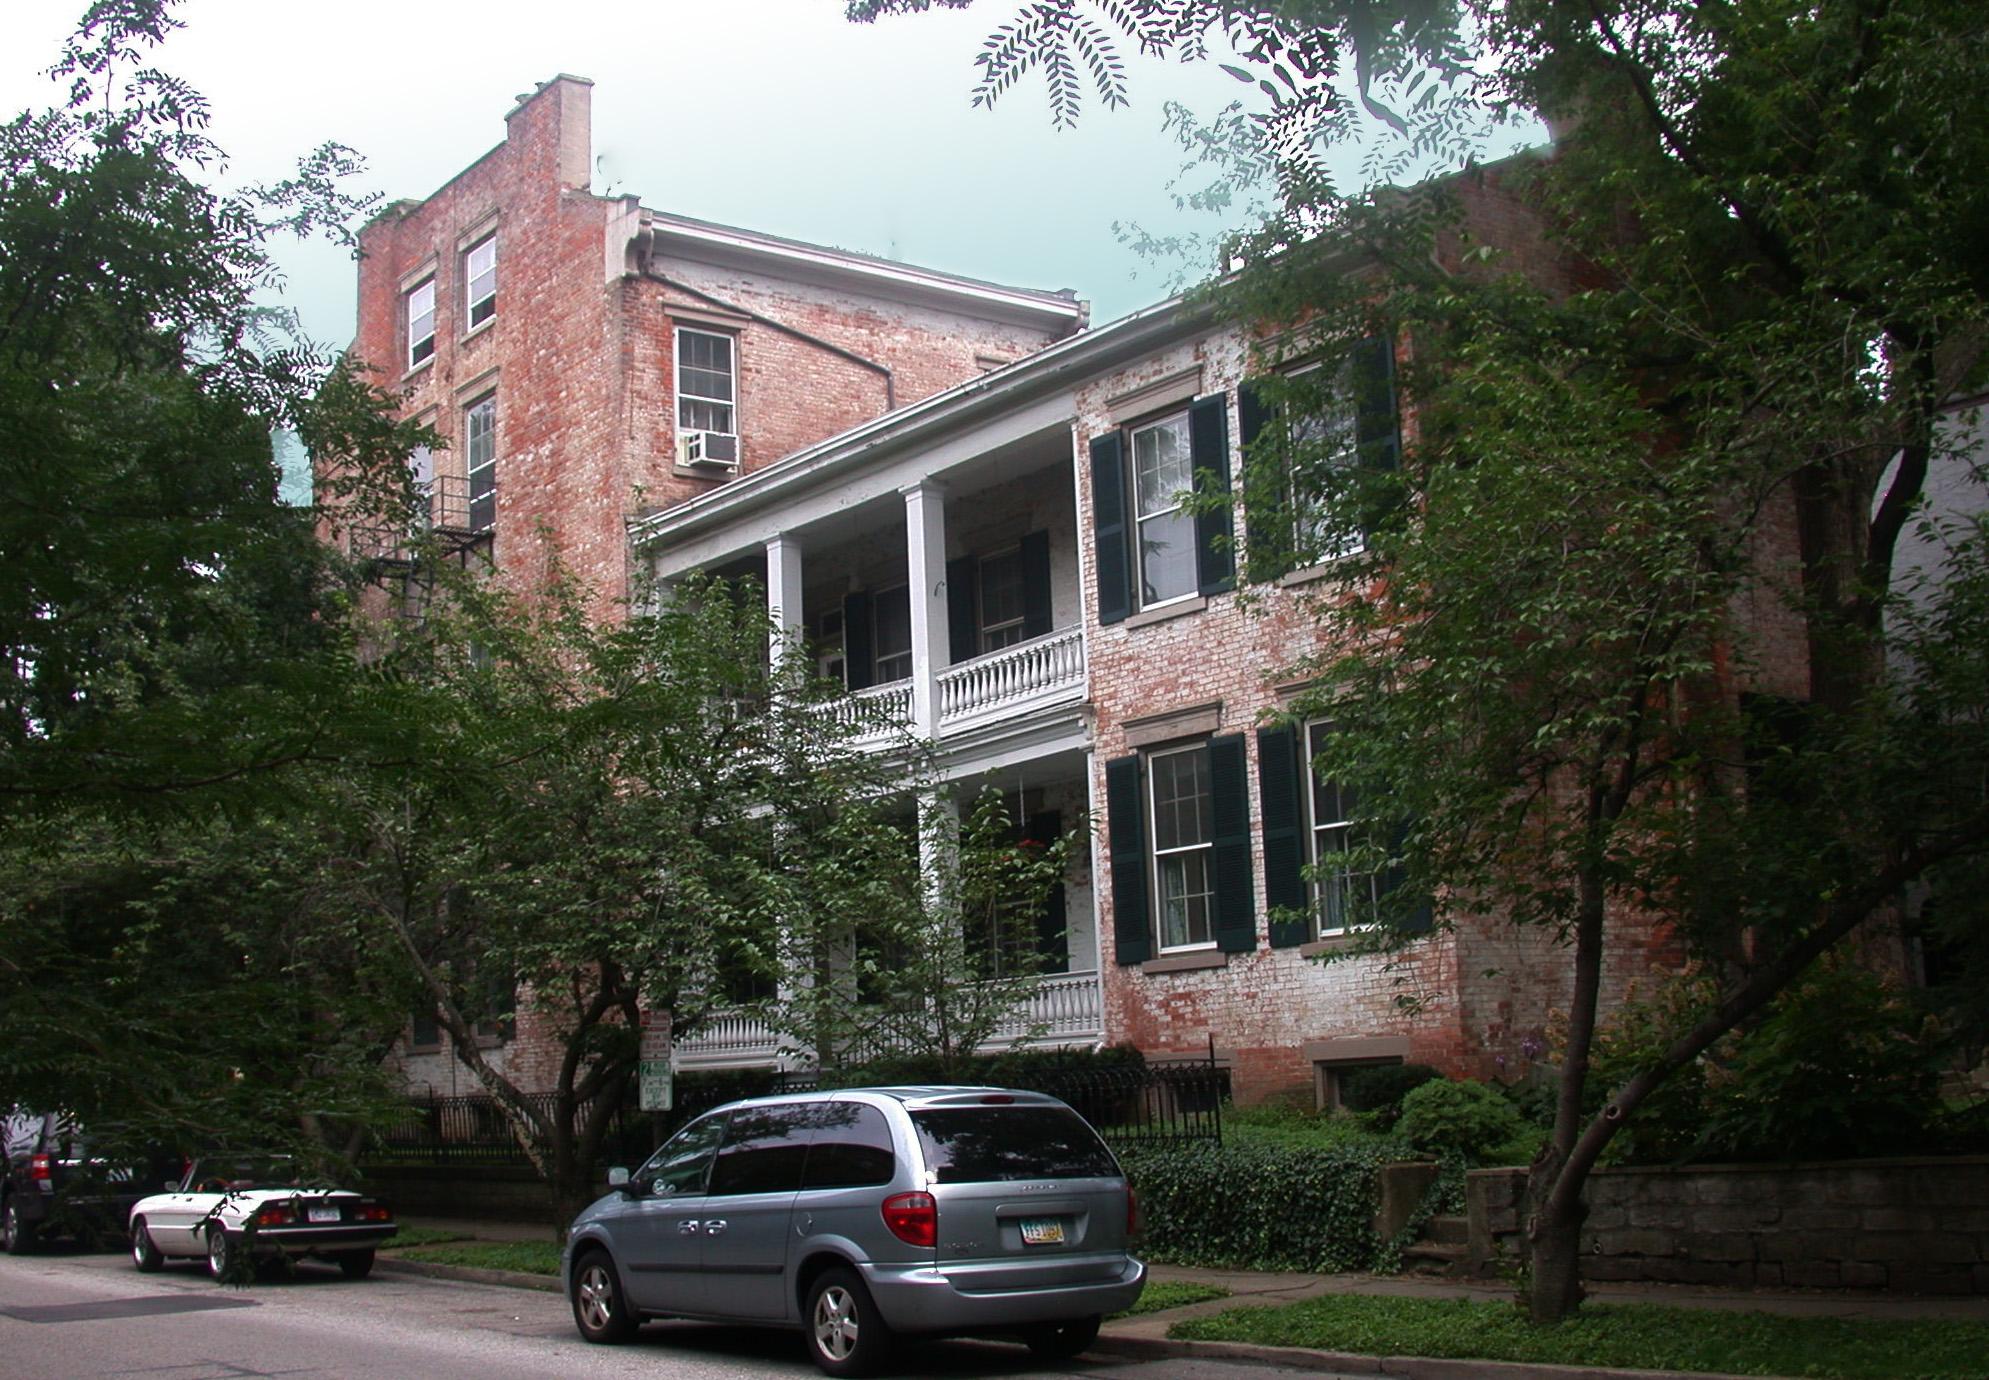 The Marmaduke Moore family home at 201 Garrard Street, Covington (Photo by Paul Tencotte)